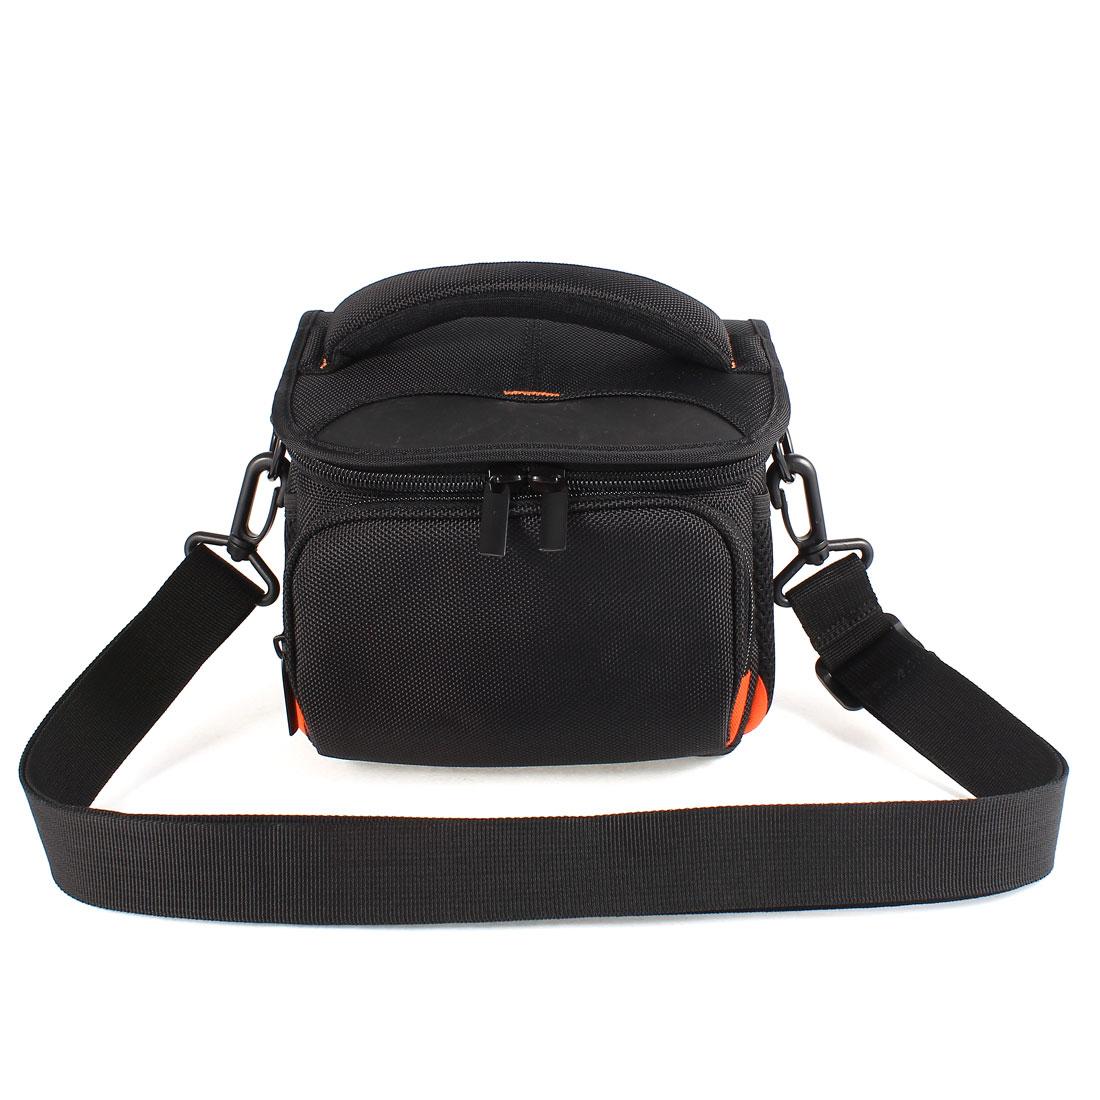 Zipper Closure 6 Pocket Handle Digital Camera Bag Case Pouch Black w Belt Strap